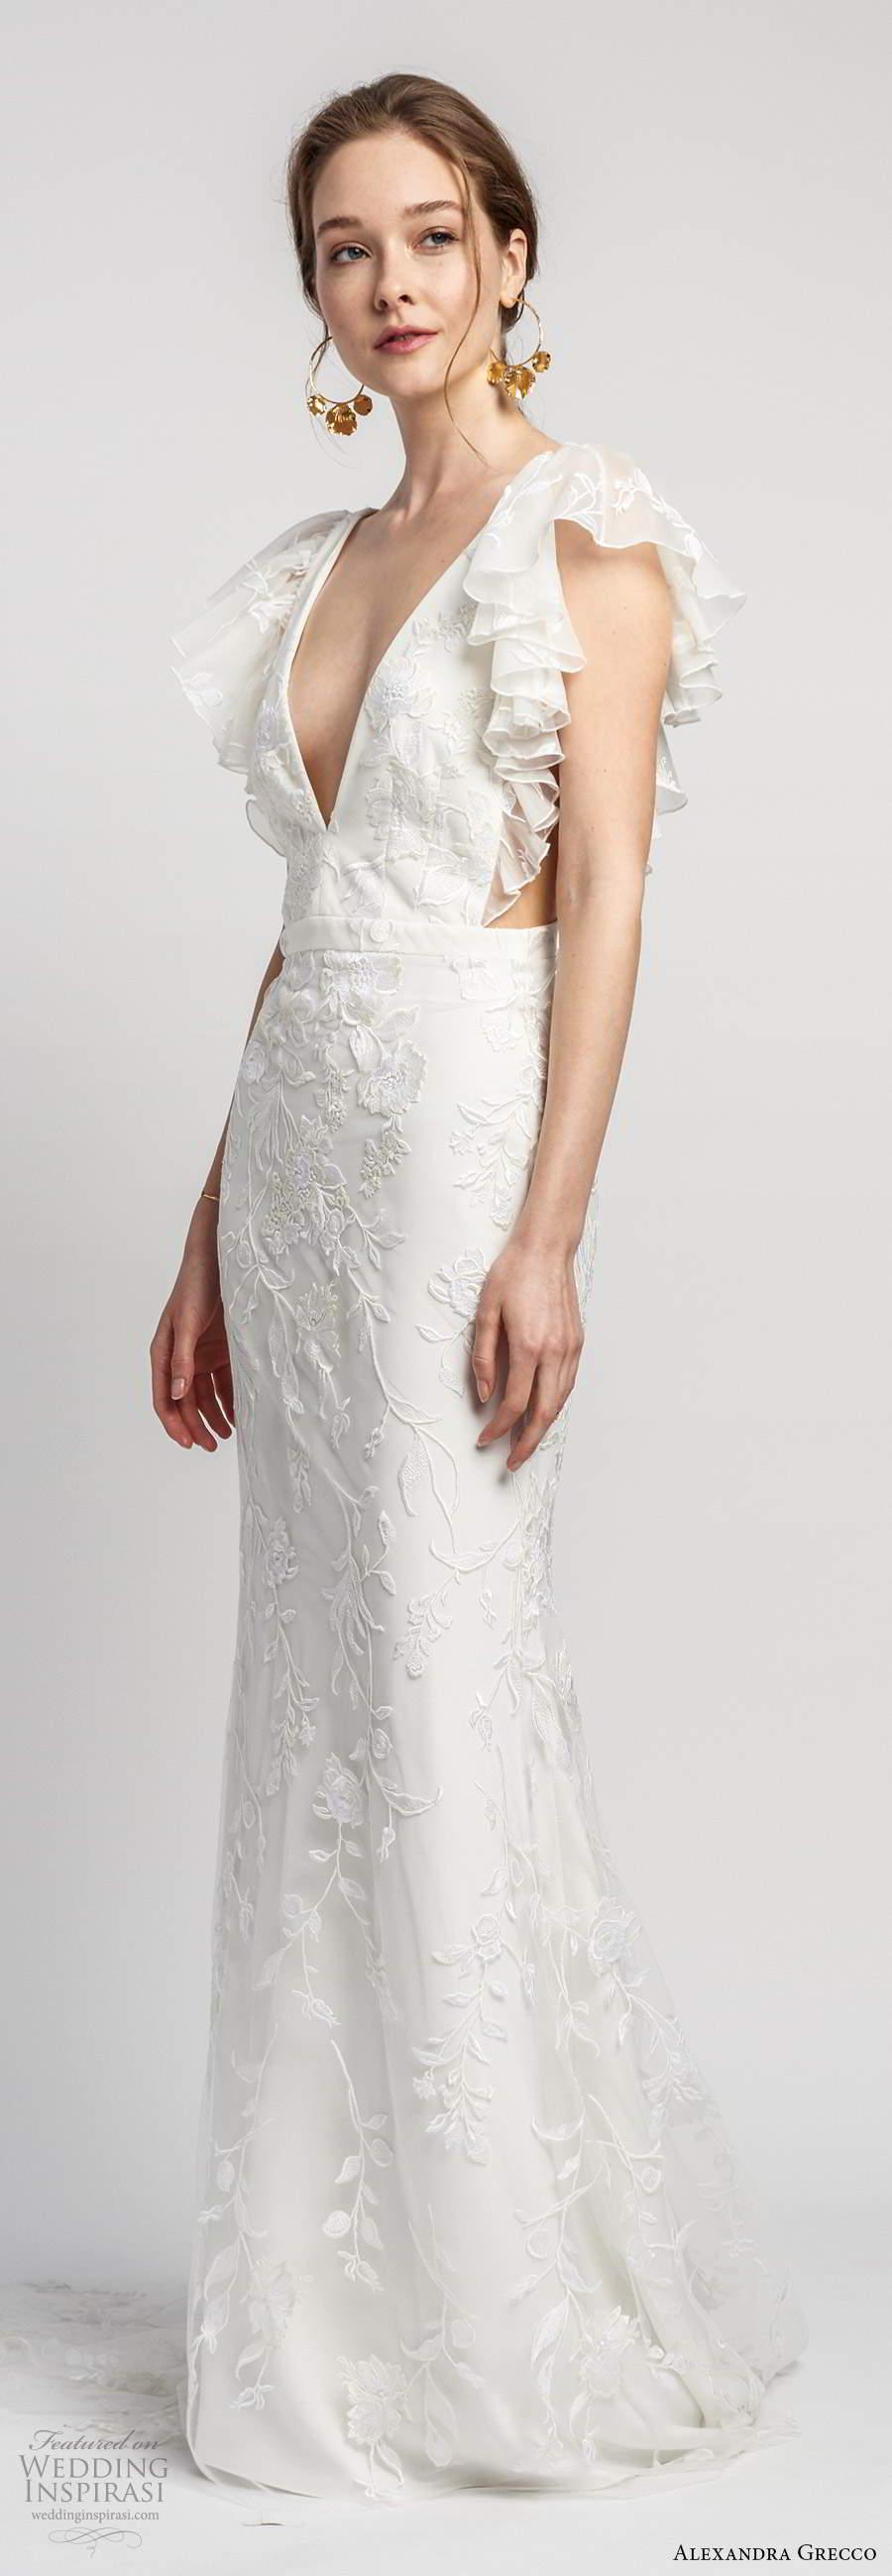 alexandra grecco 2020 bridal short flutter sleeves plunging v neckline side cutouts fully embellished lace trumpet sheath wedding dress v back chapel train (6) mv